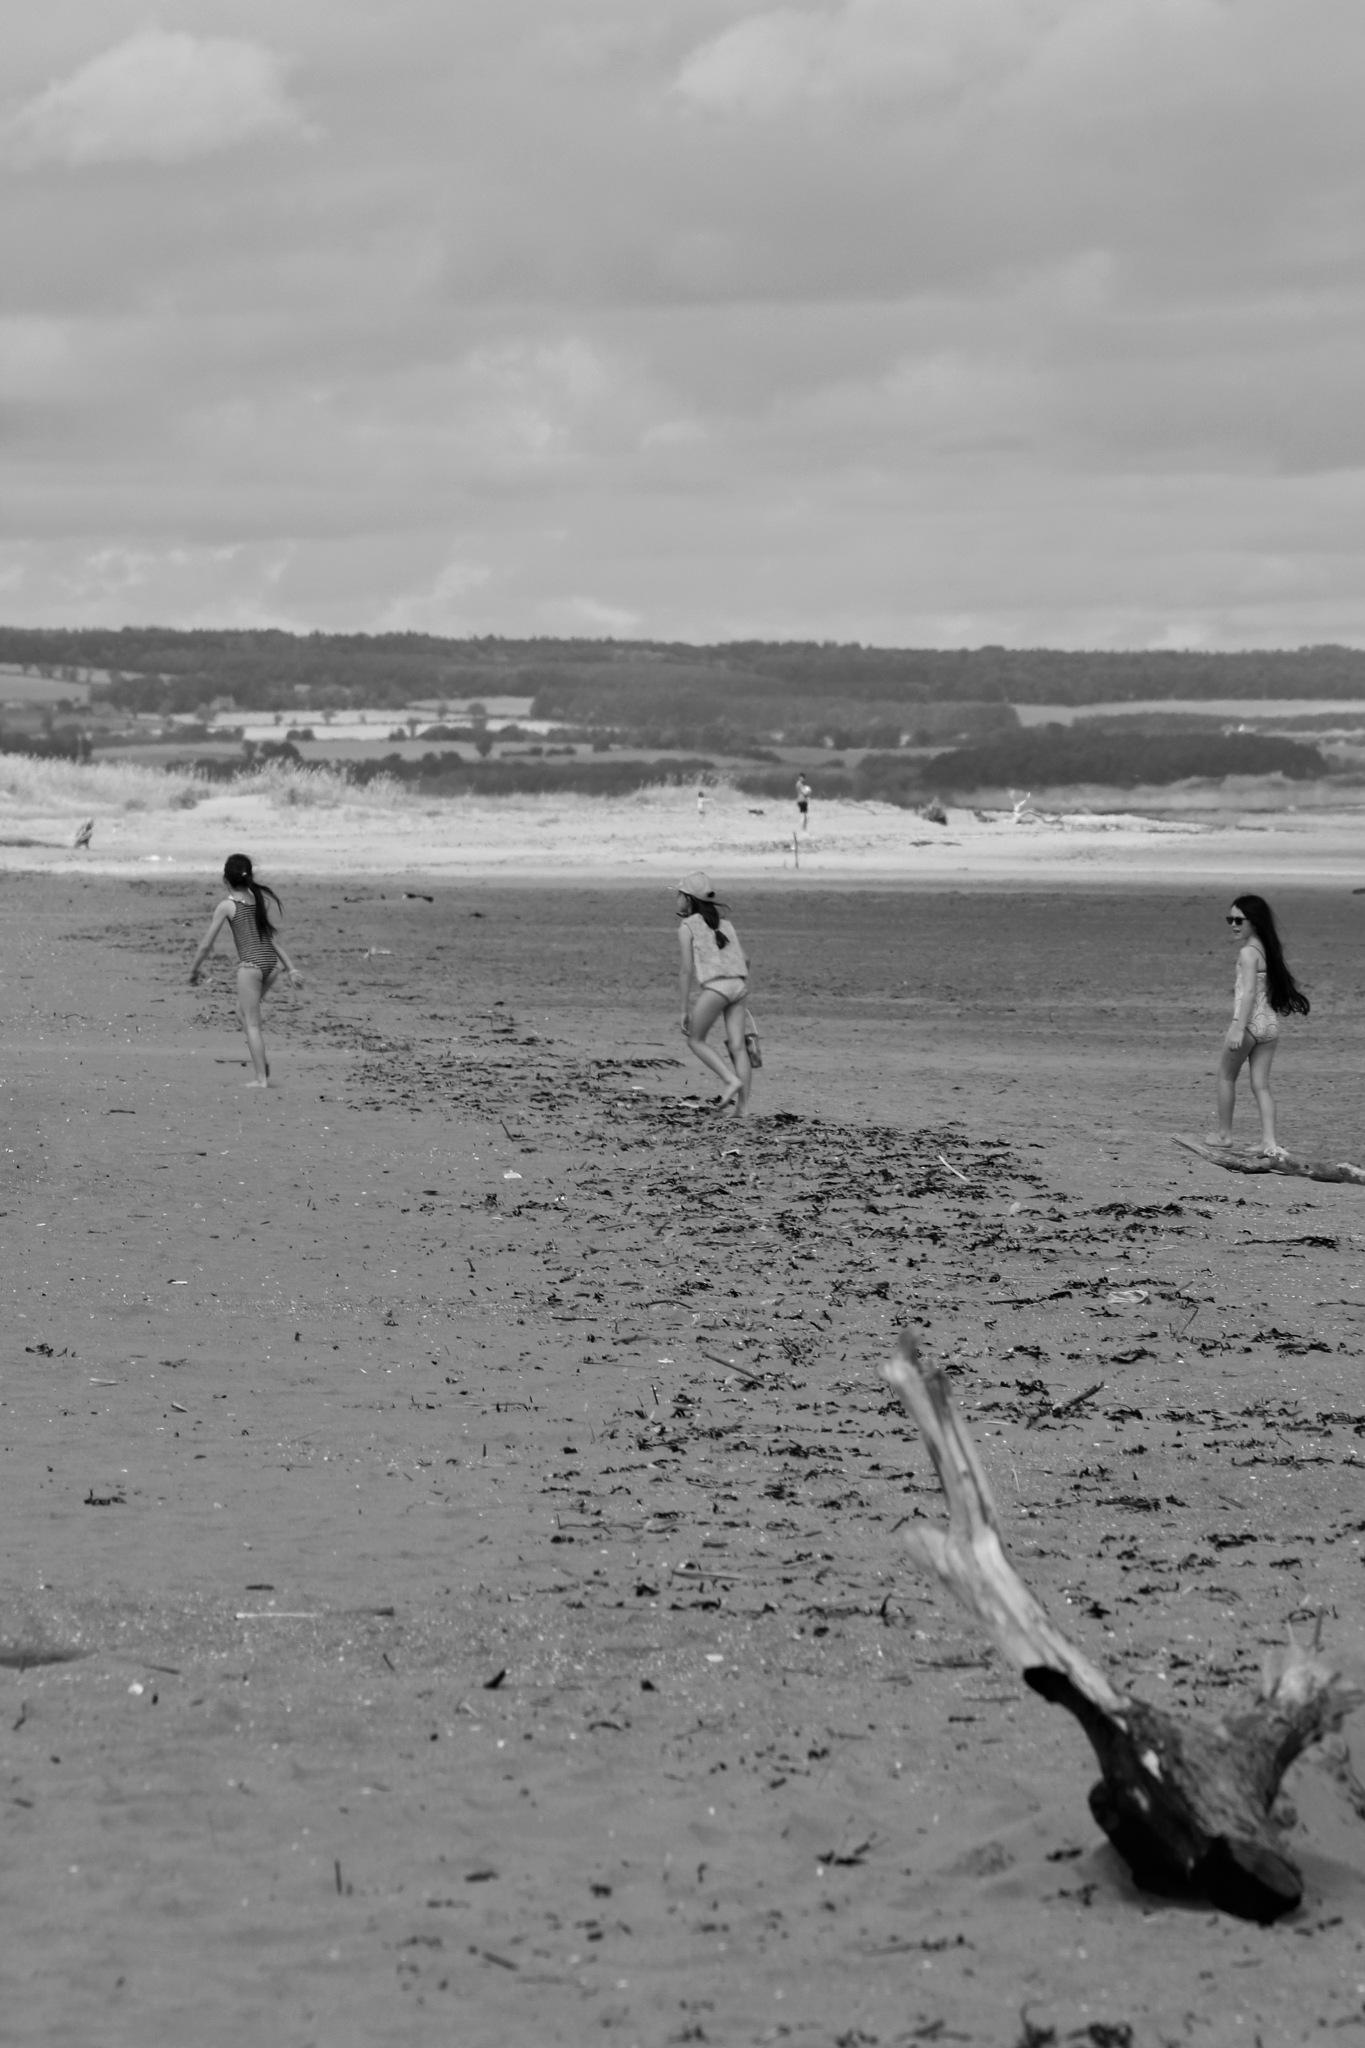 Beach scene by Rich66